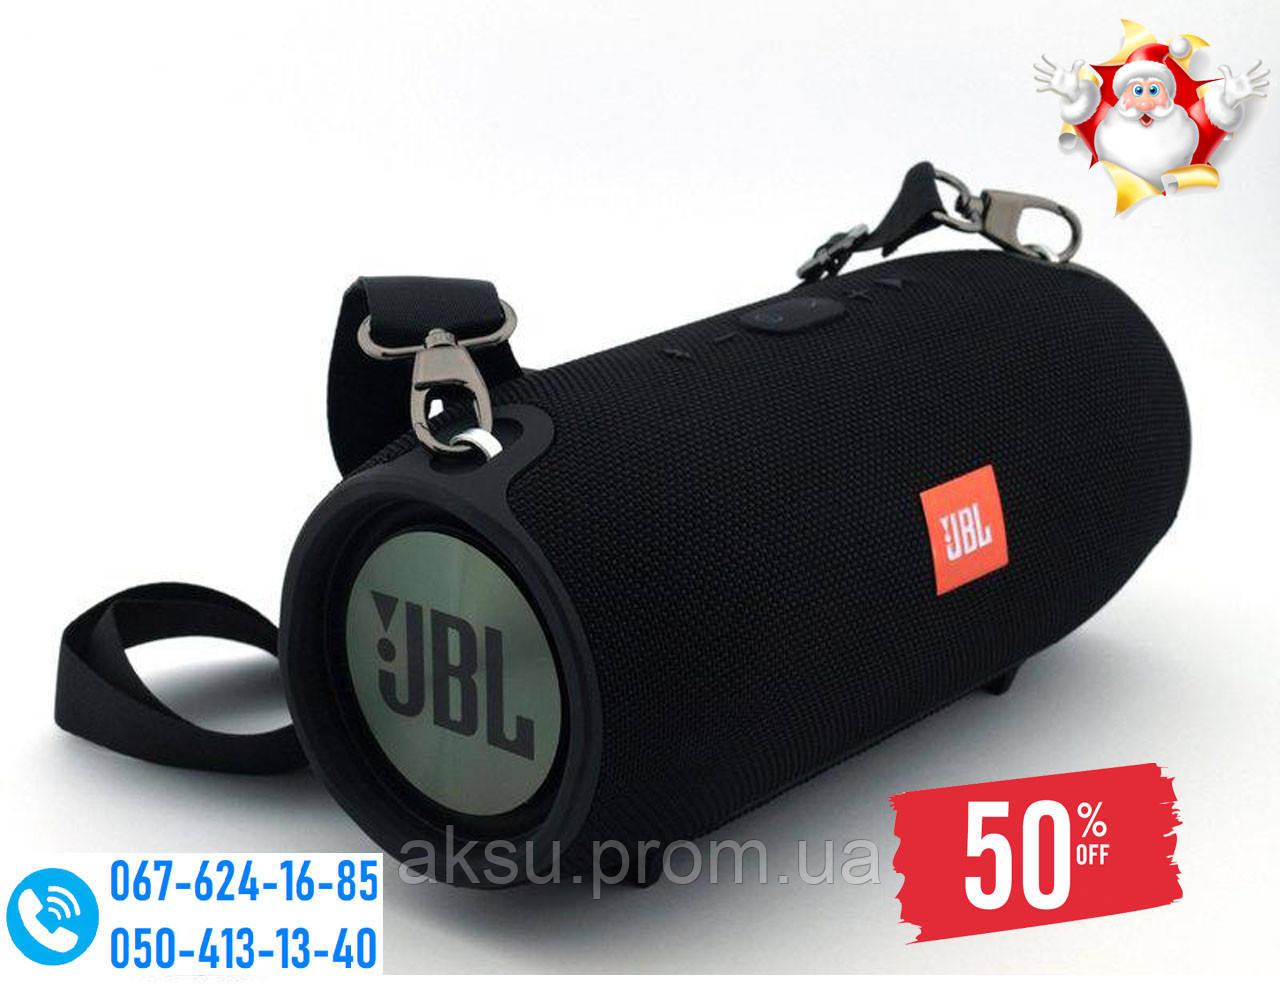 Колонка JBL XTREME BIG bluetooth БЛЮТУЗ Экстрим Большая 30 сантиметров MP3 FM USB